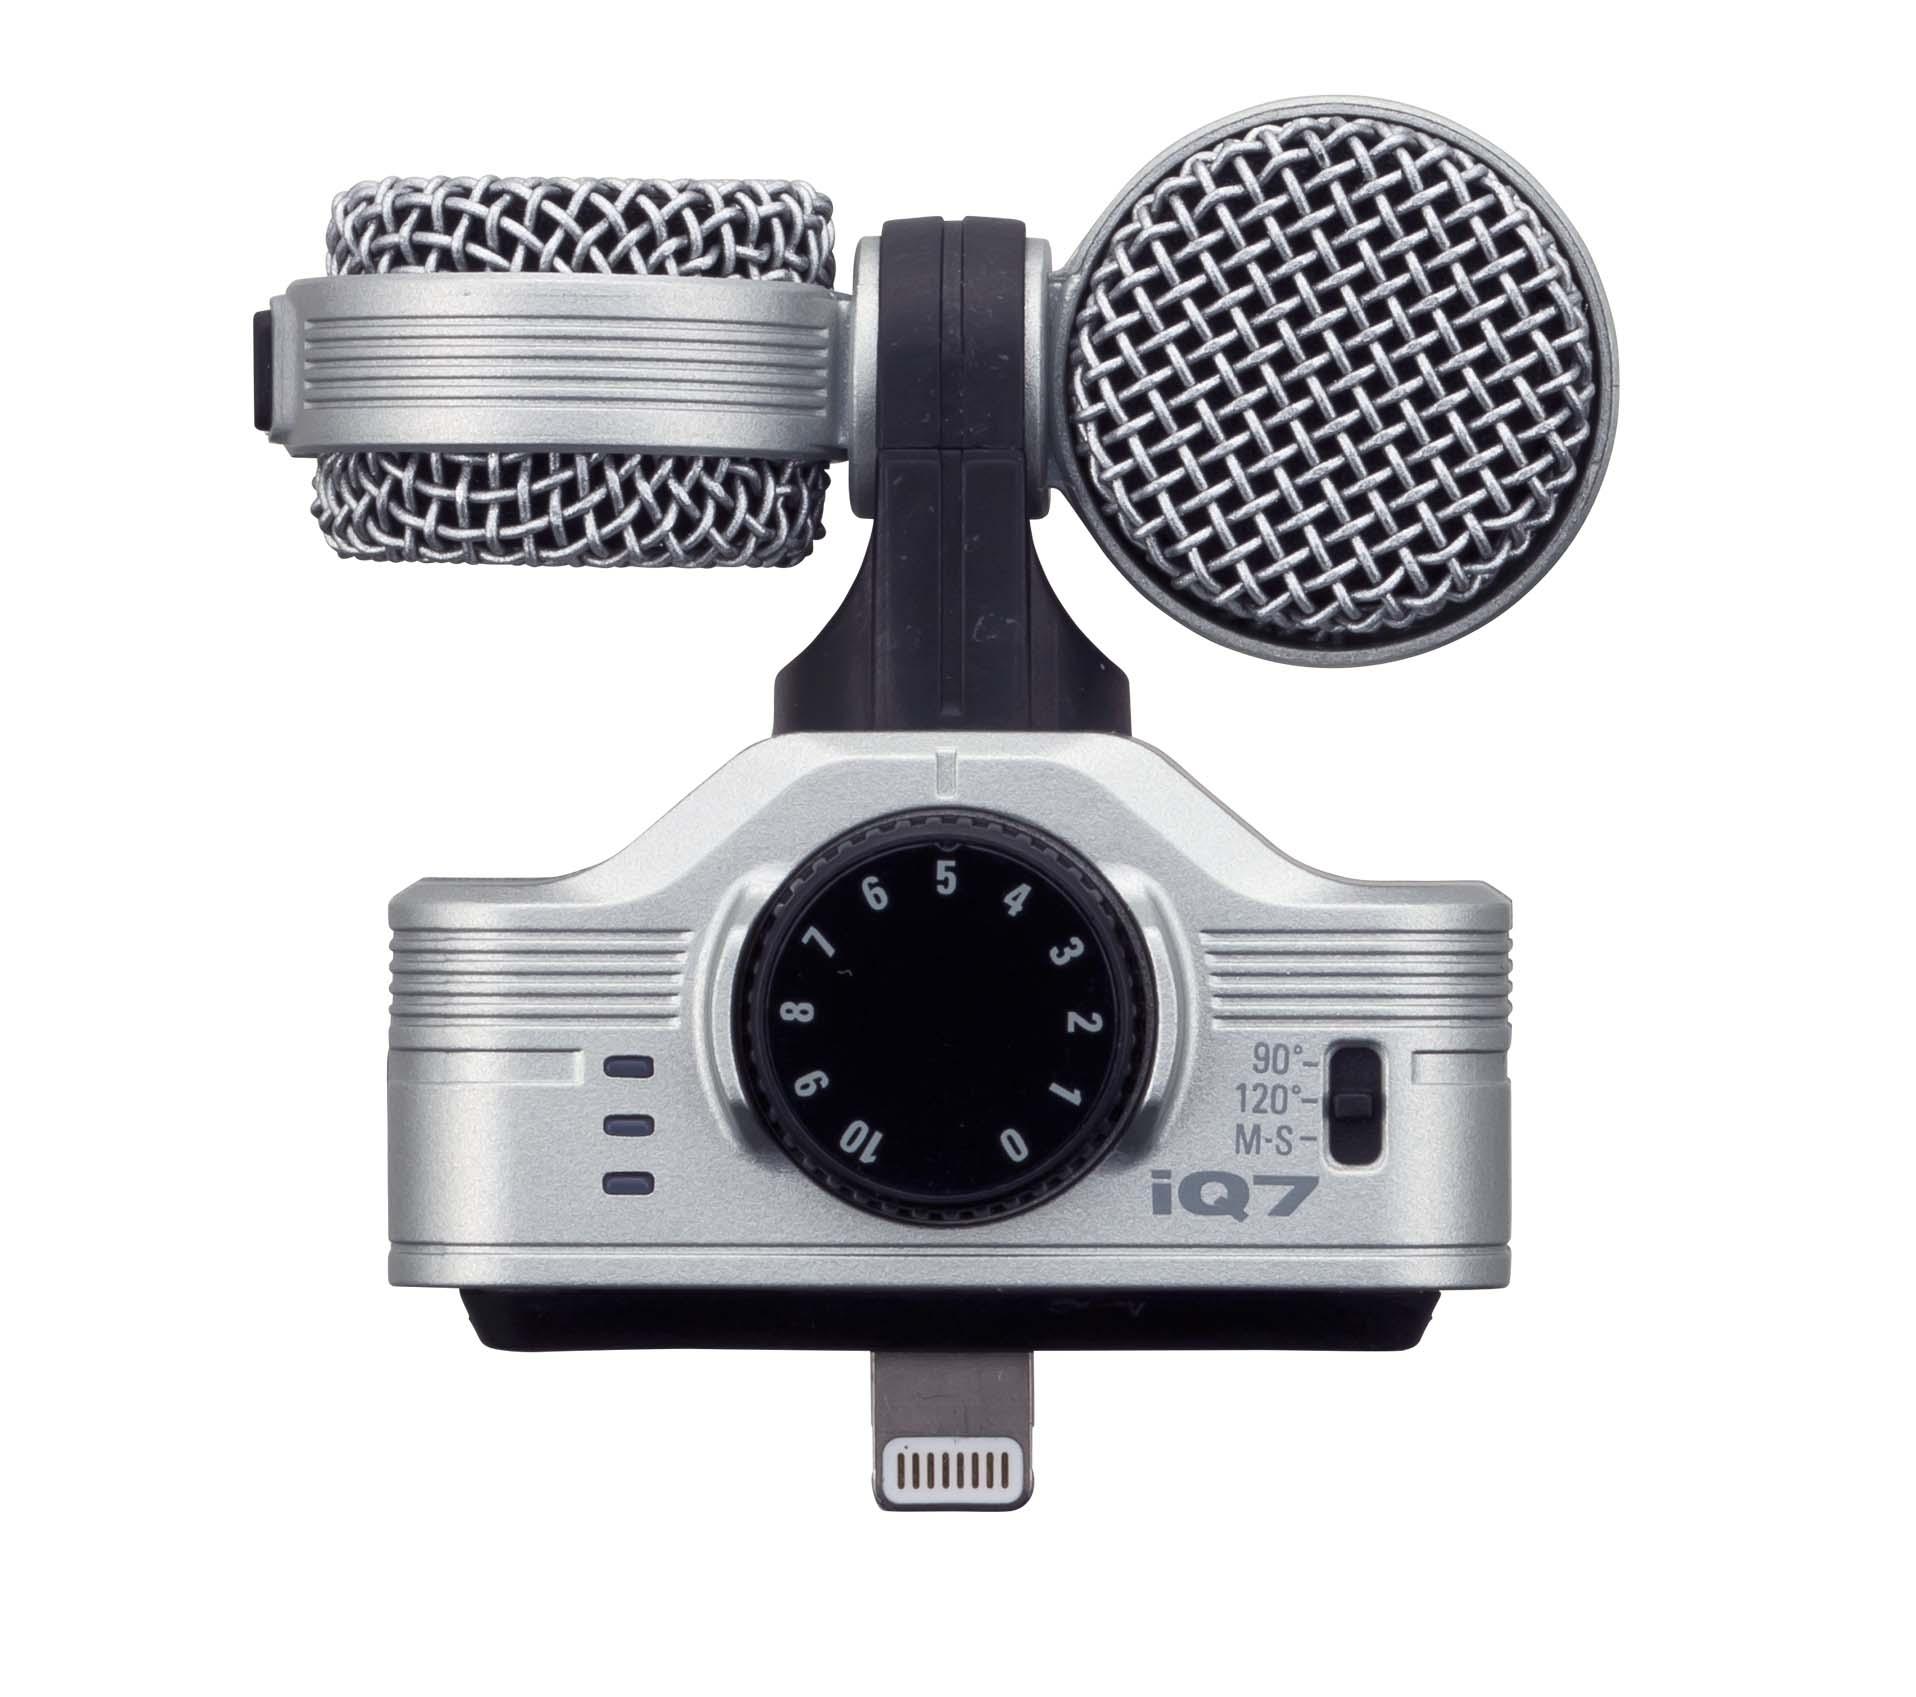 Zoom iQ7 MS Stereo Mikrofon für iPhone, iPad und iPod Touch 101918